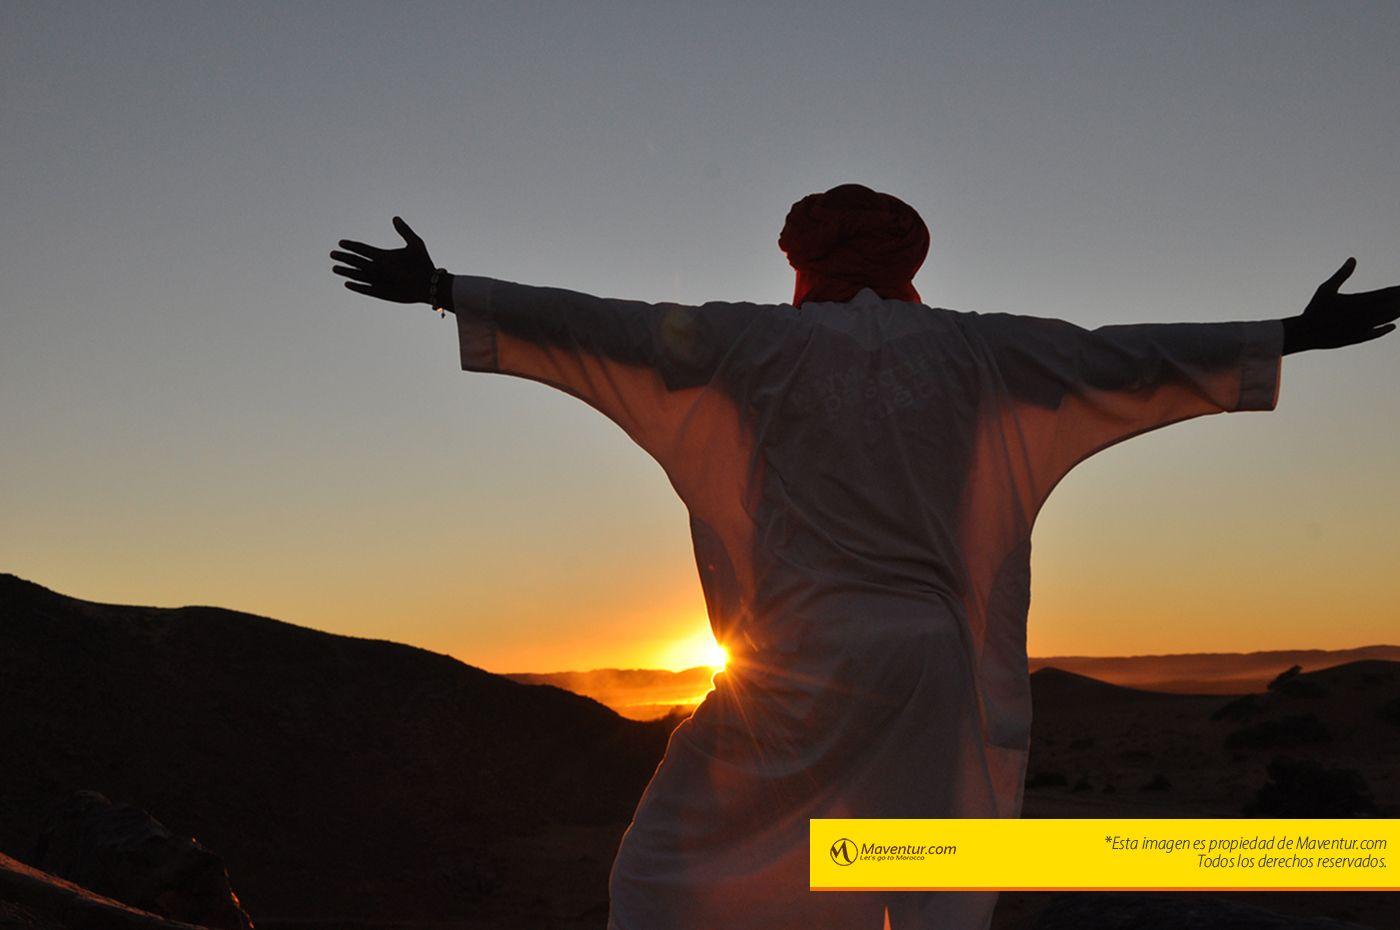 maventur tours desert fotografia